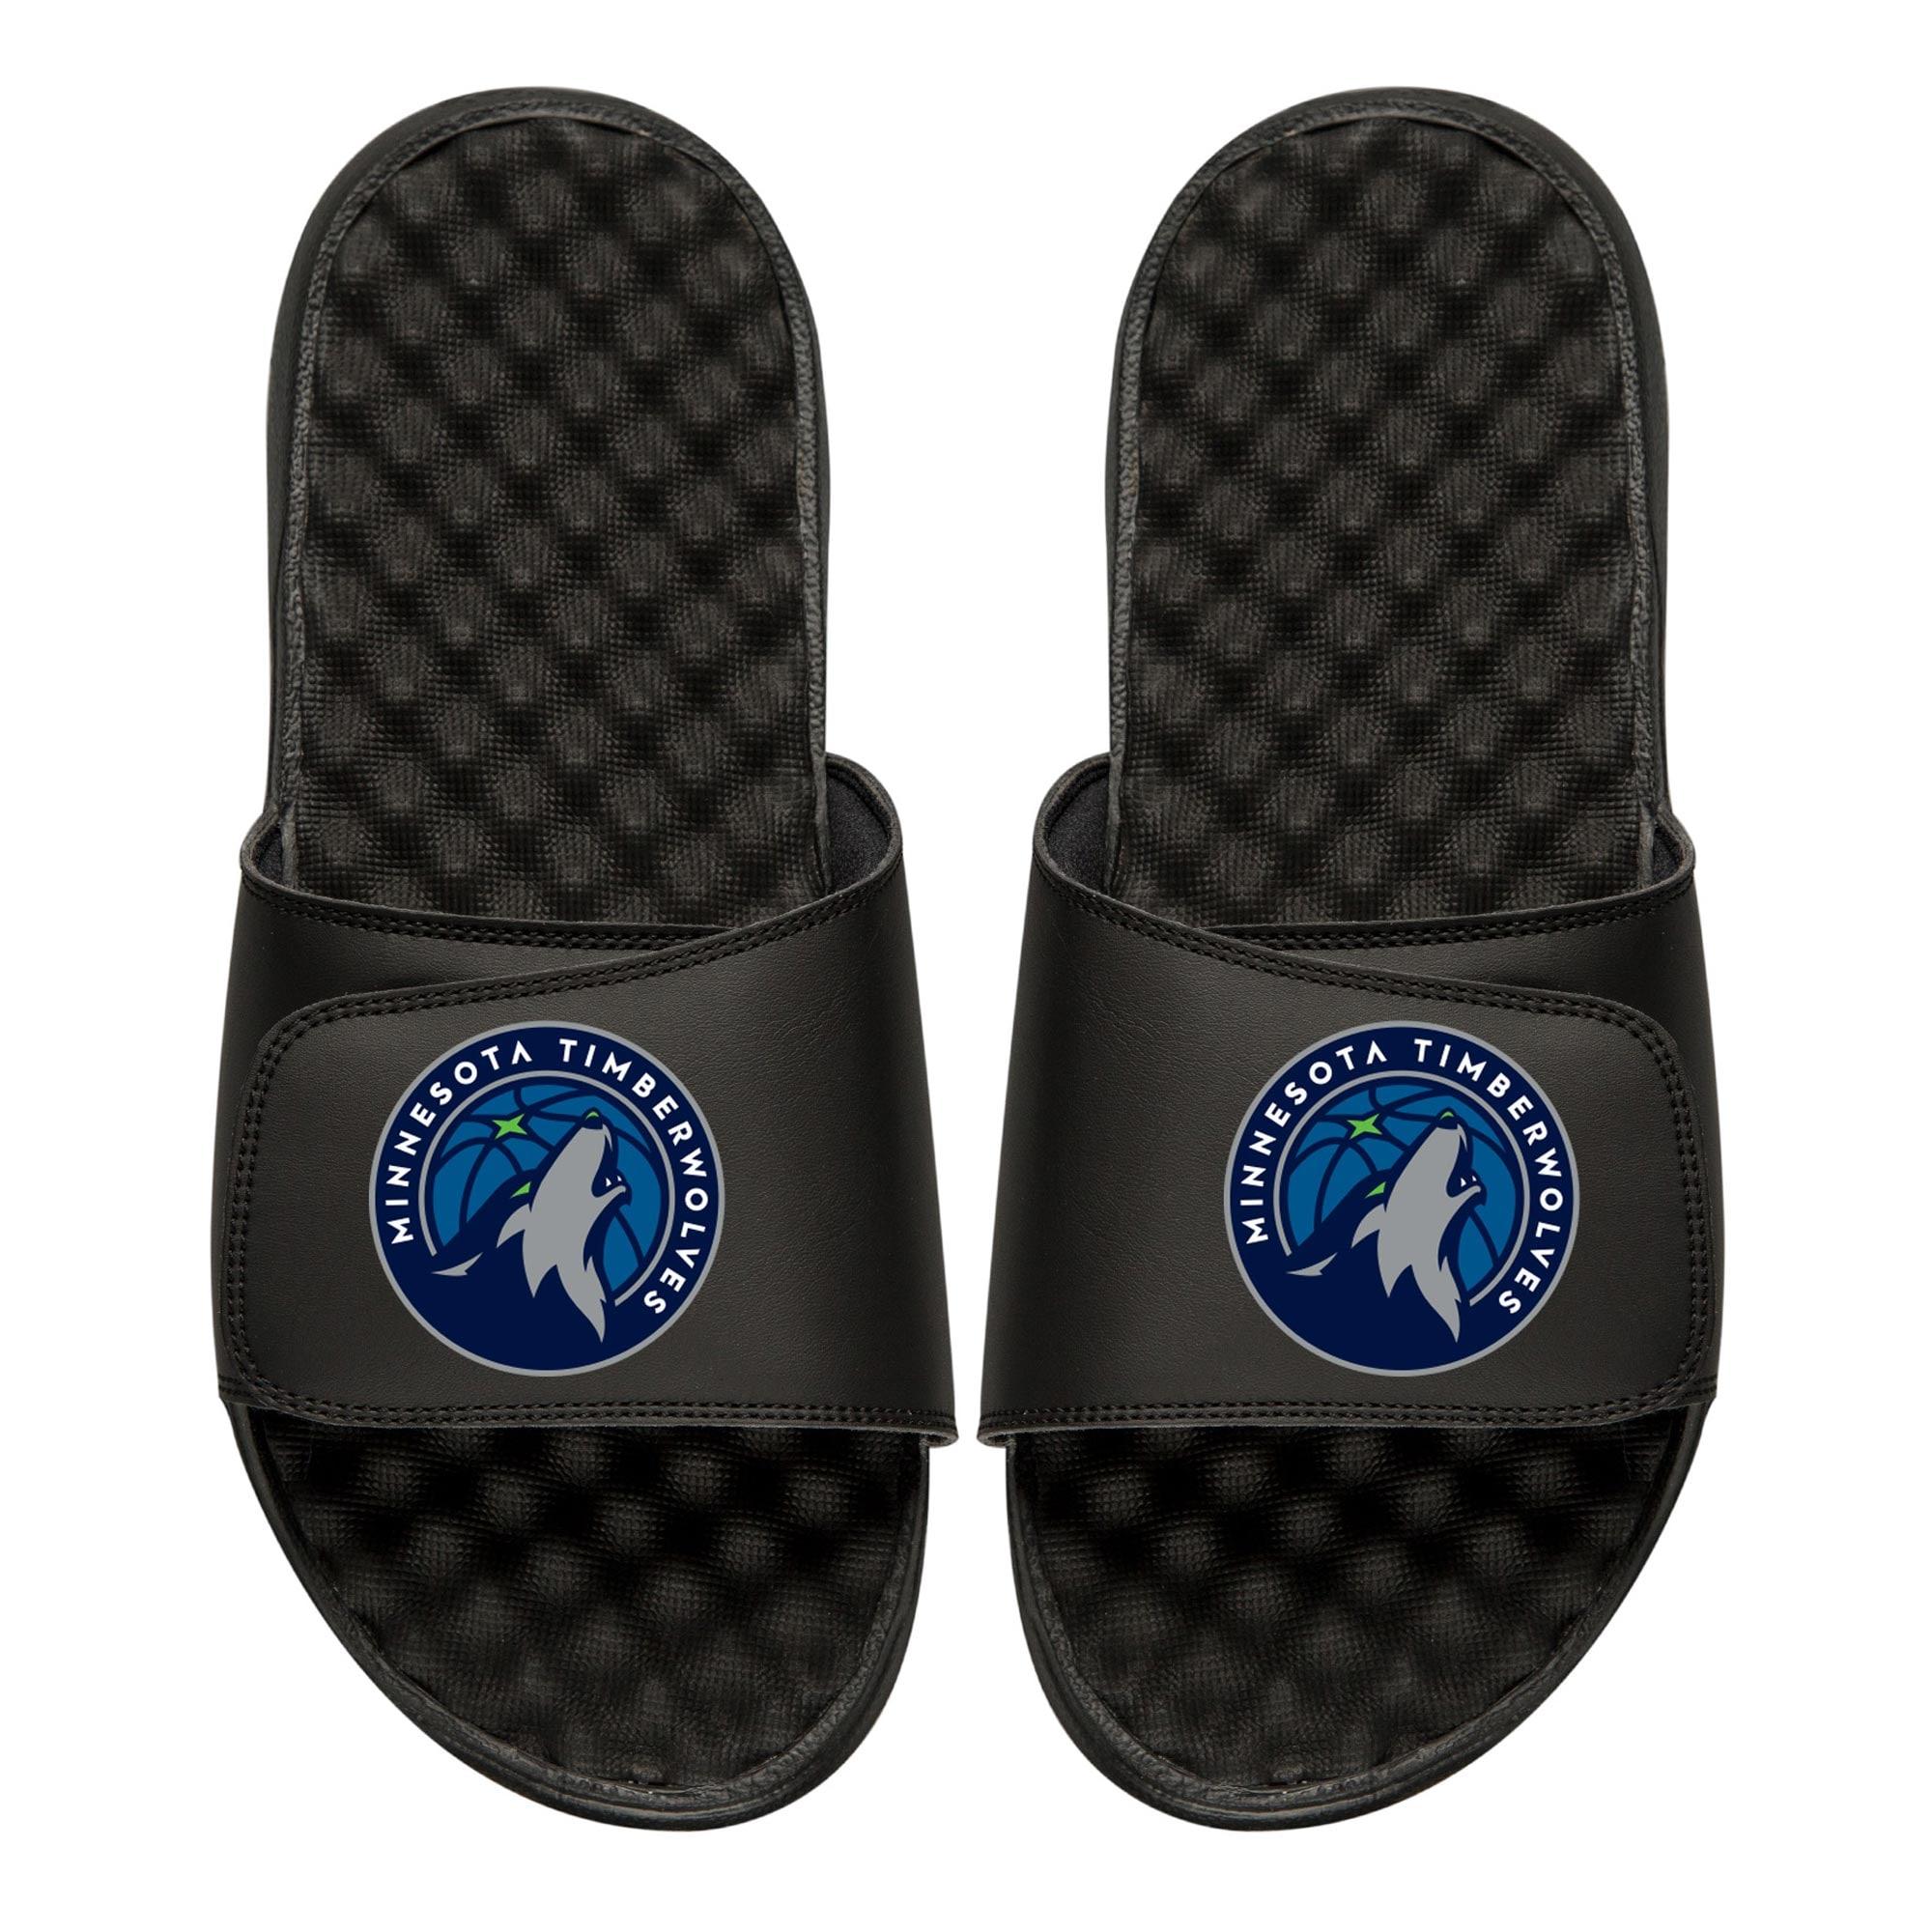 Minnesota Timberwolves Primary iSlide Sandals - Black